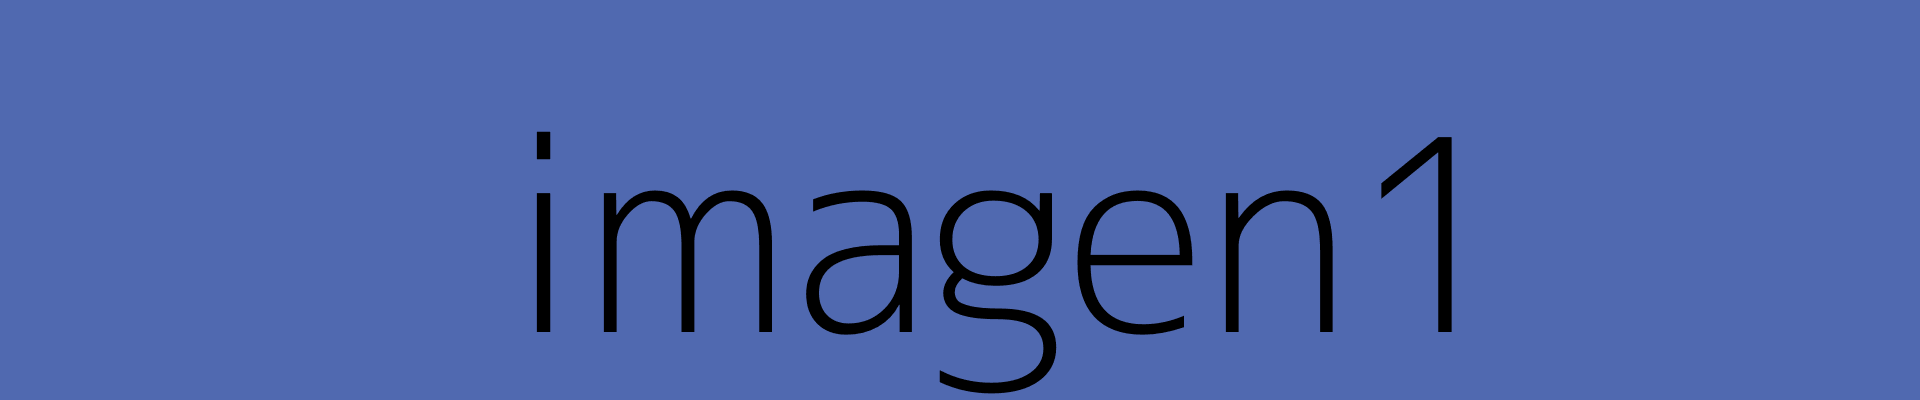 imagen1banner2